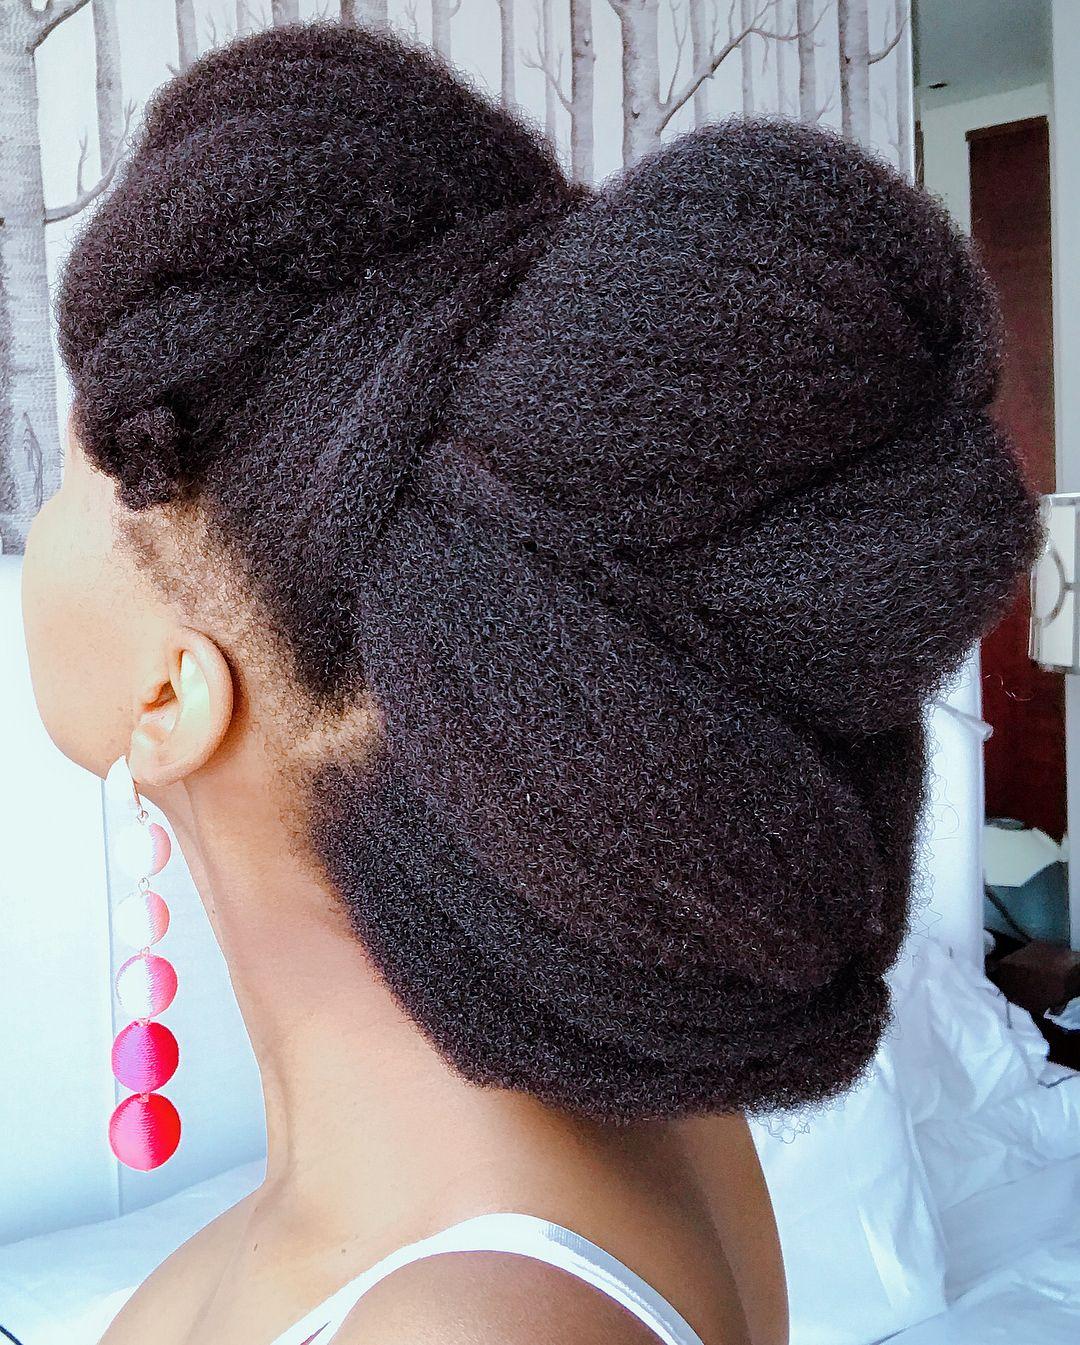 Afro Hairstyles hairstyleforblackwomen.net 30